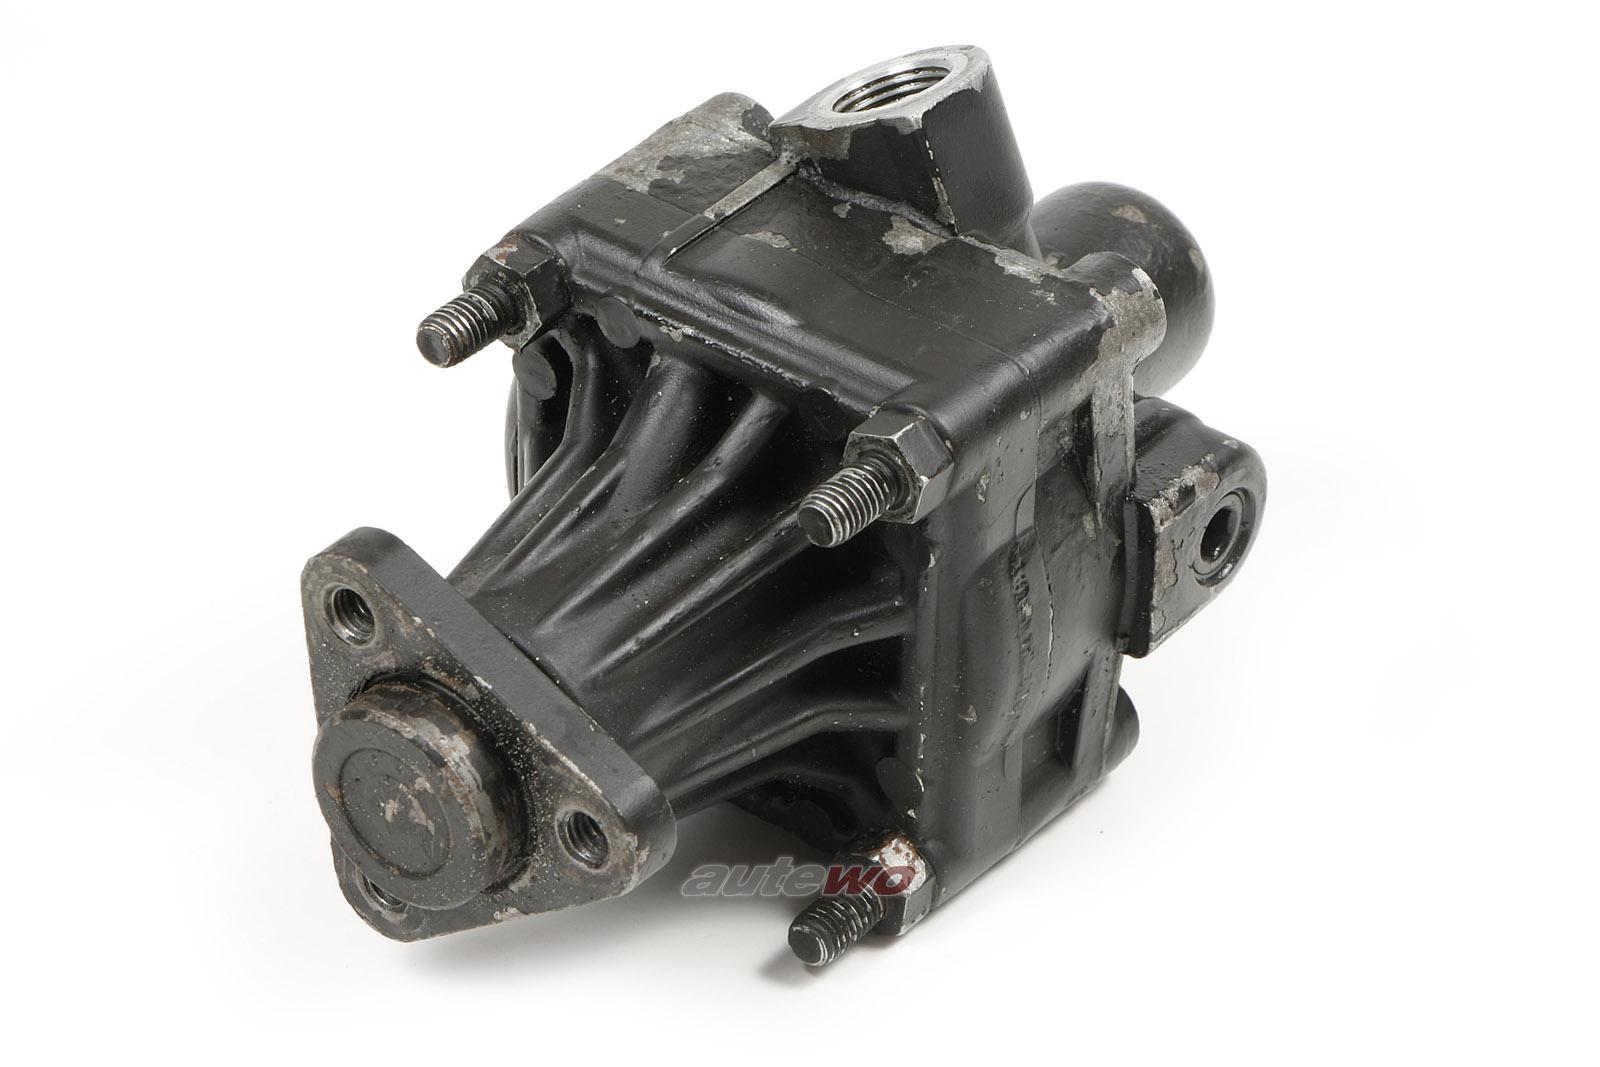 050145155AX 050145155A Audi 80 B4 4 Zylinder Servopumpe